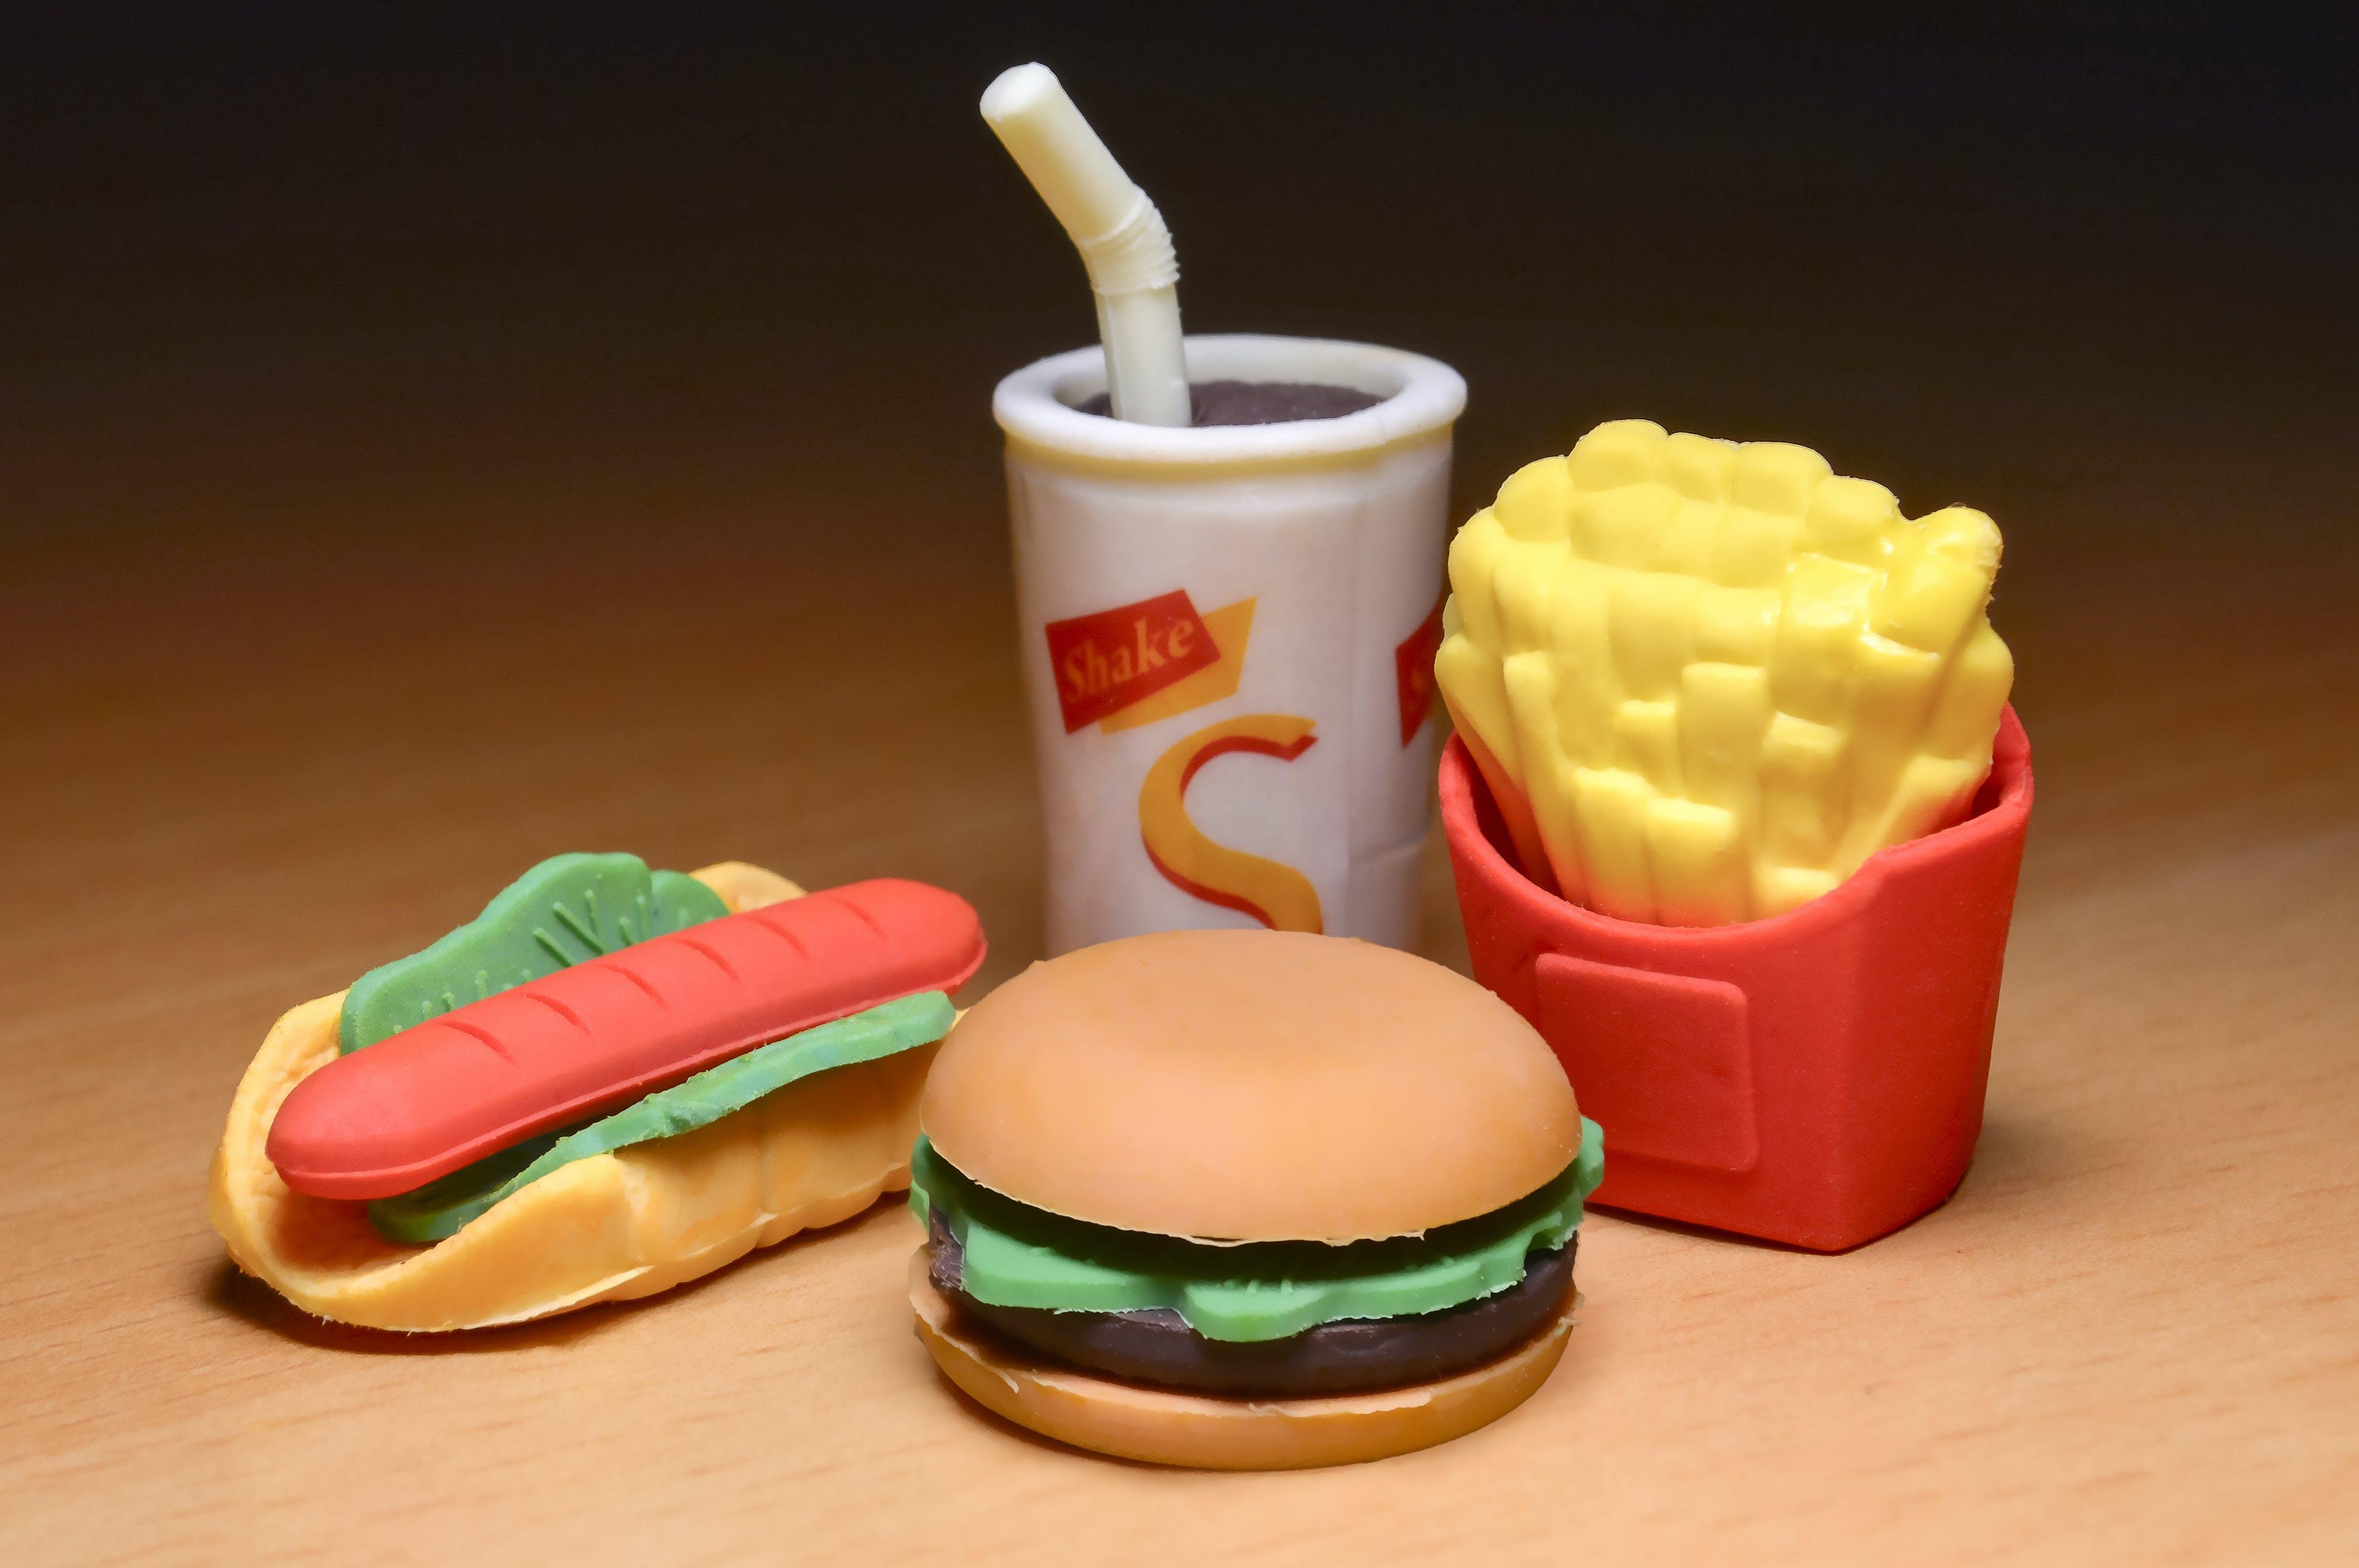 Free stock photo of chips, comida, comida chatarra, comida rapida